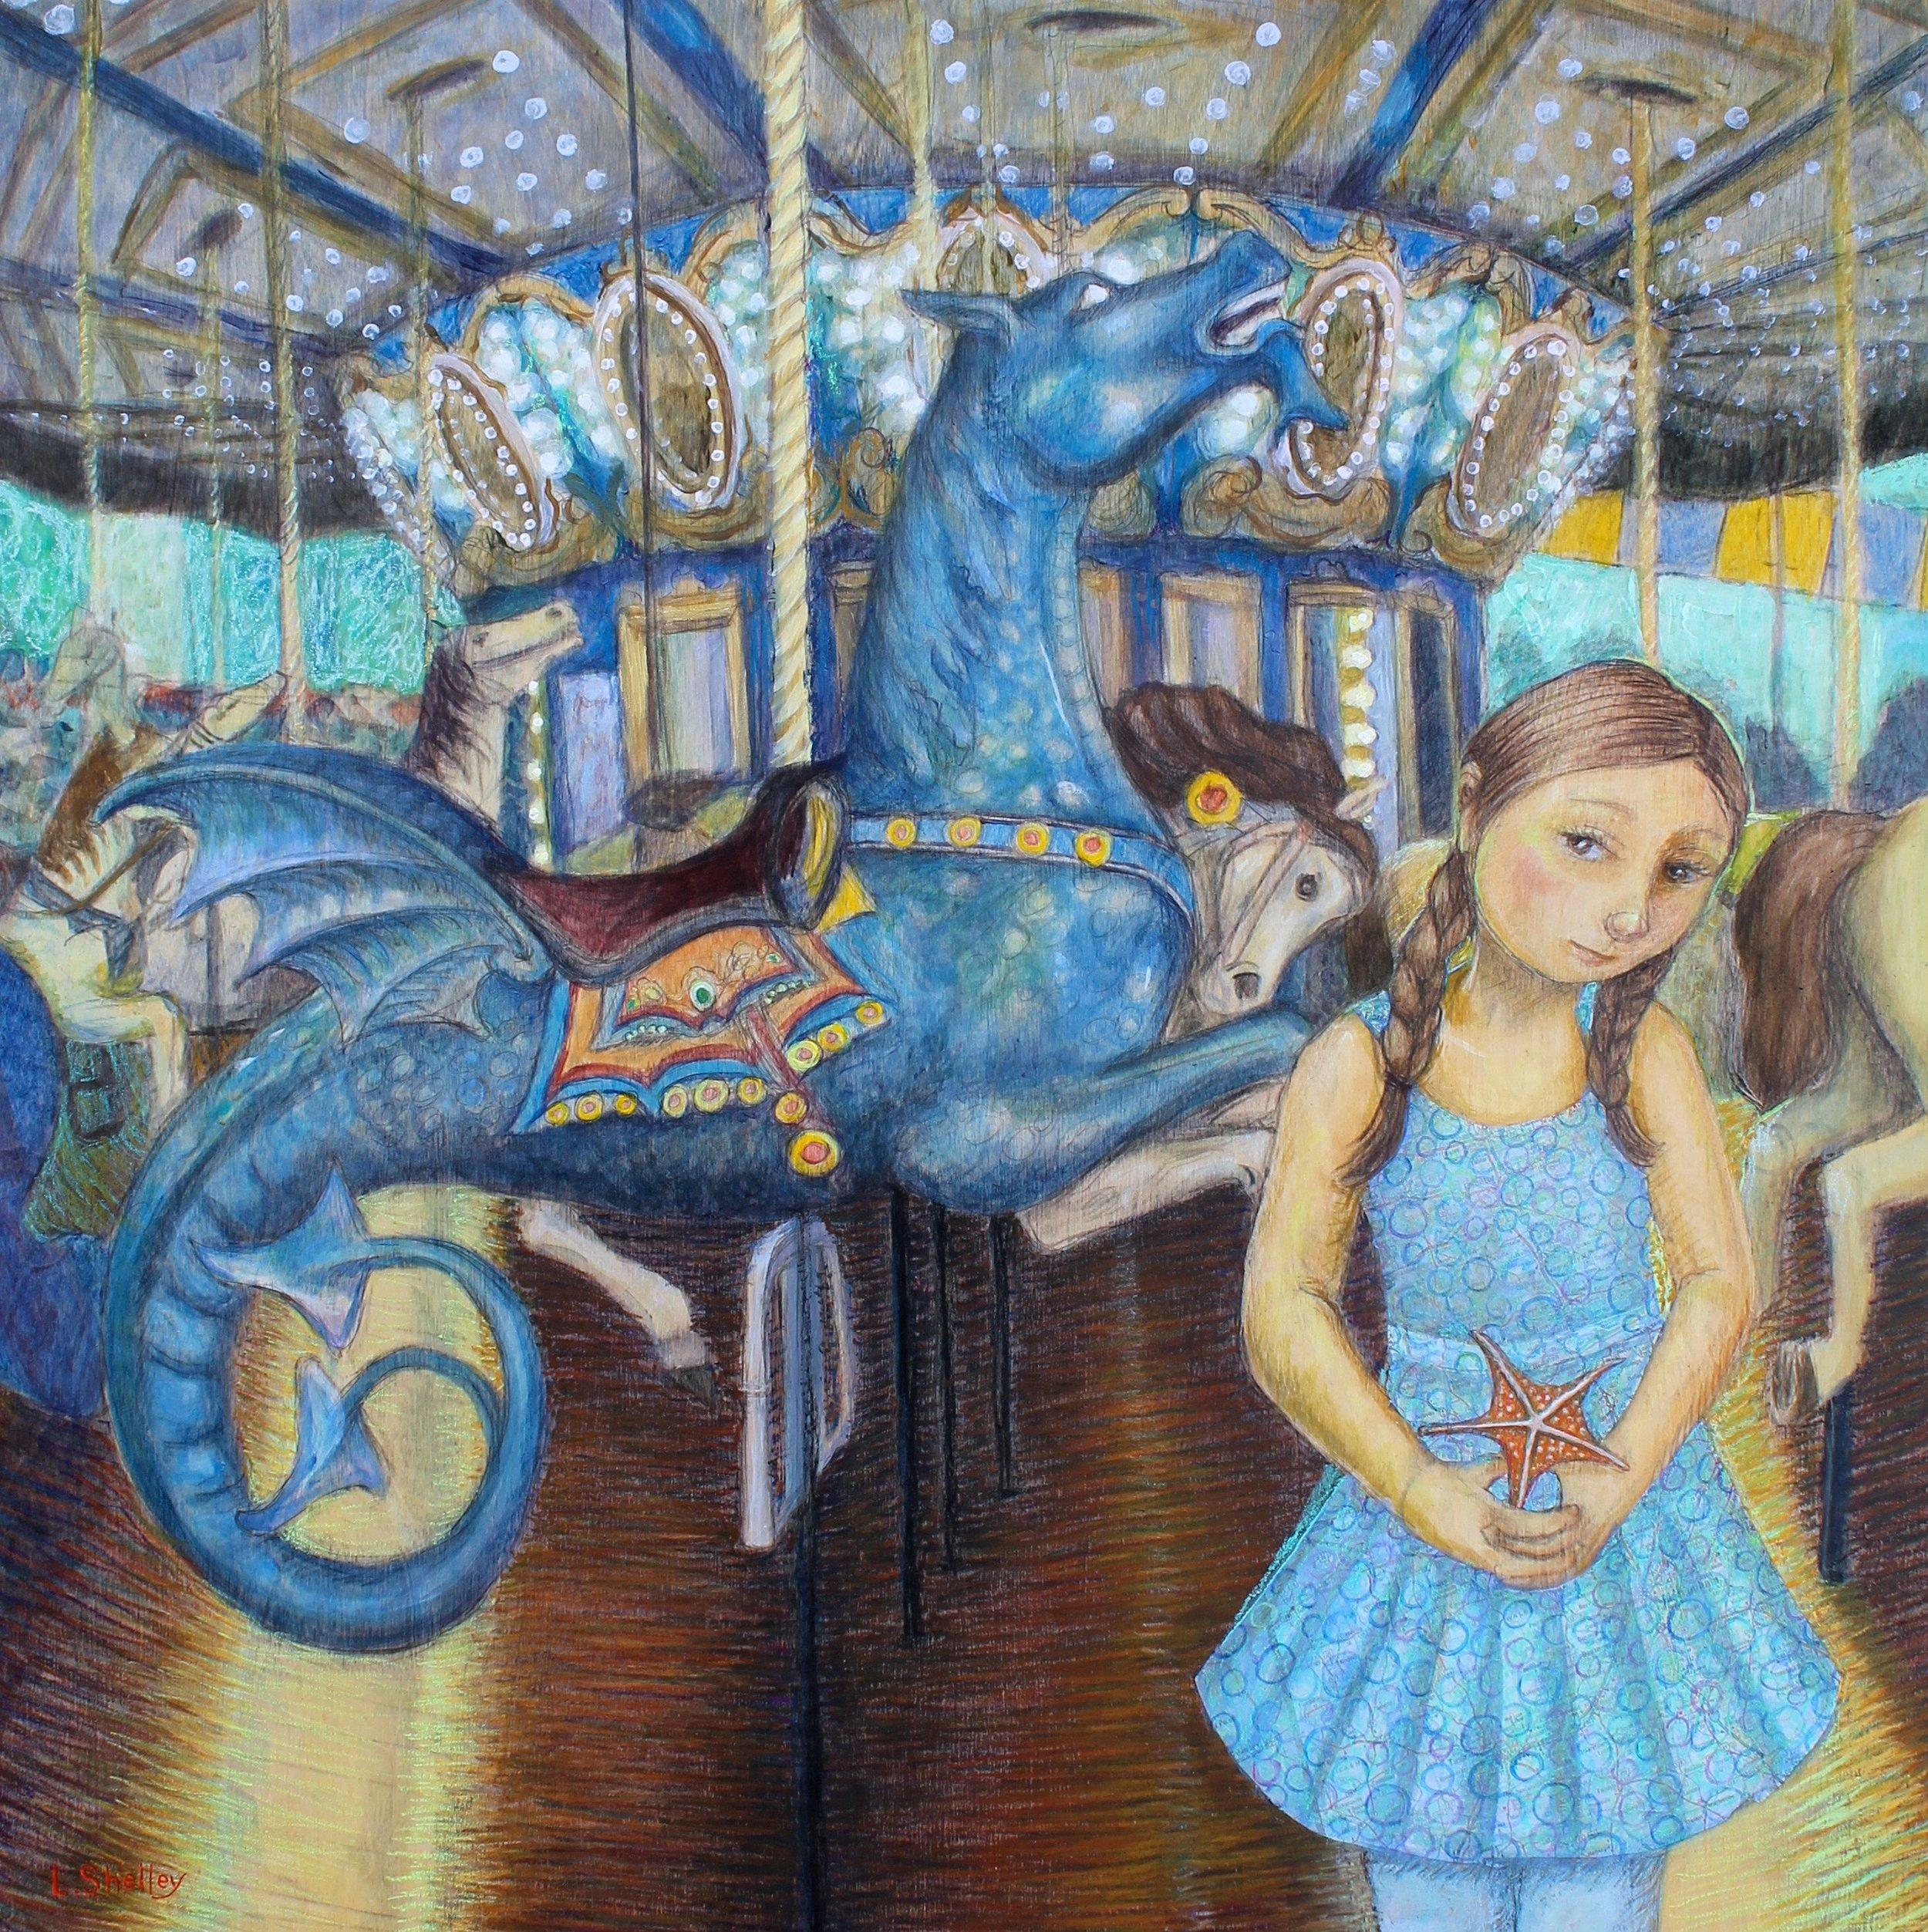 Carousel in Blue